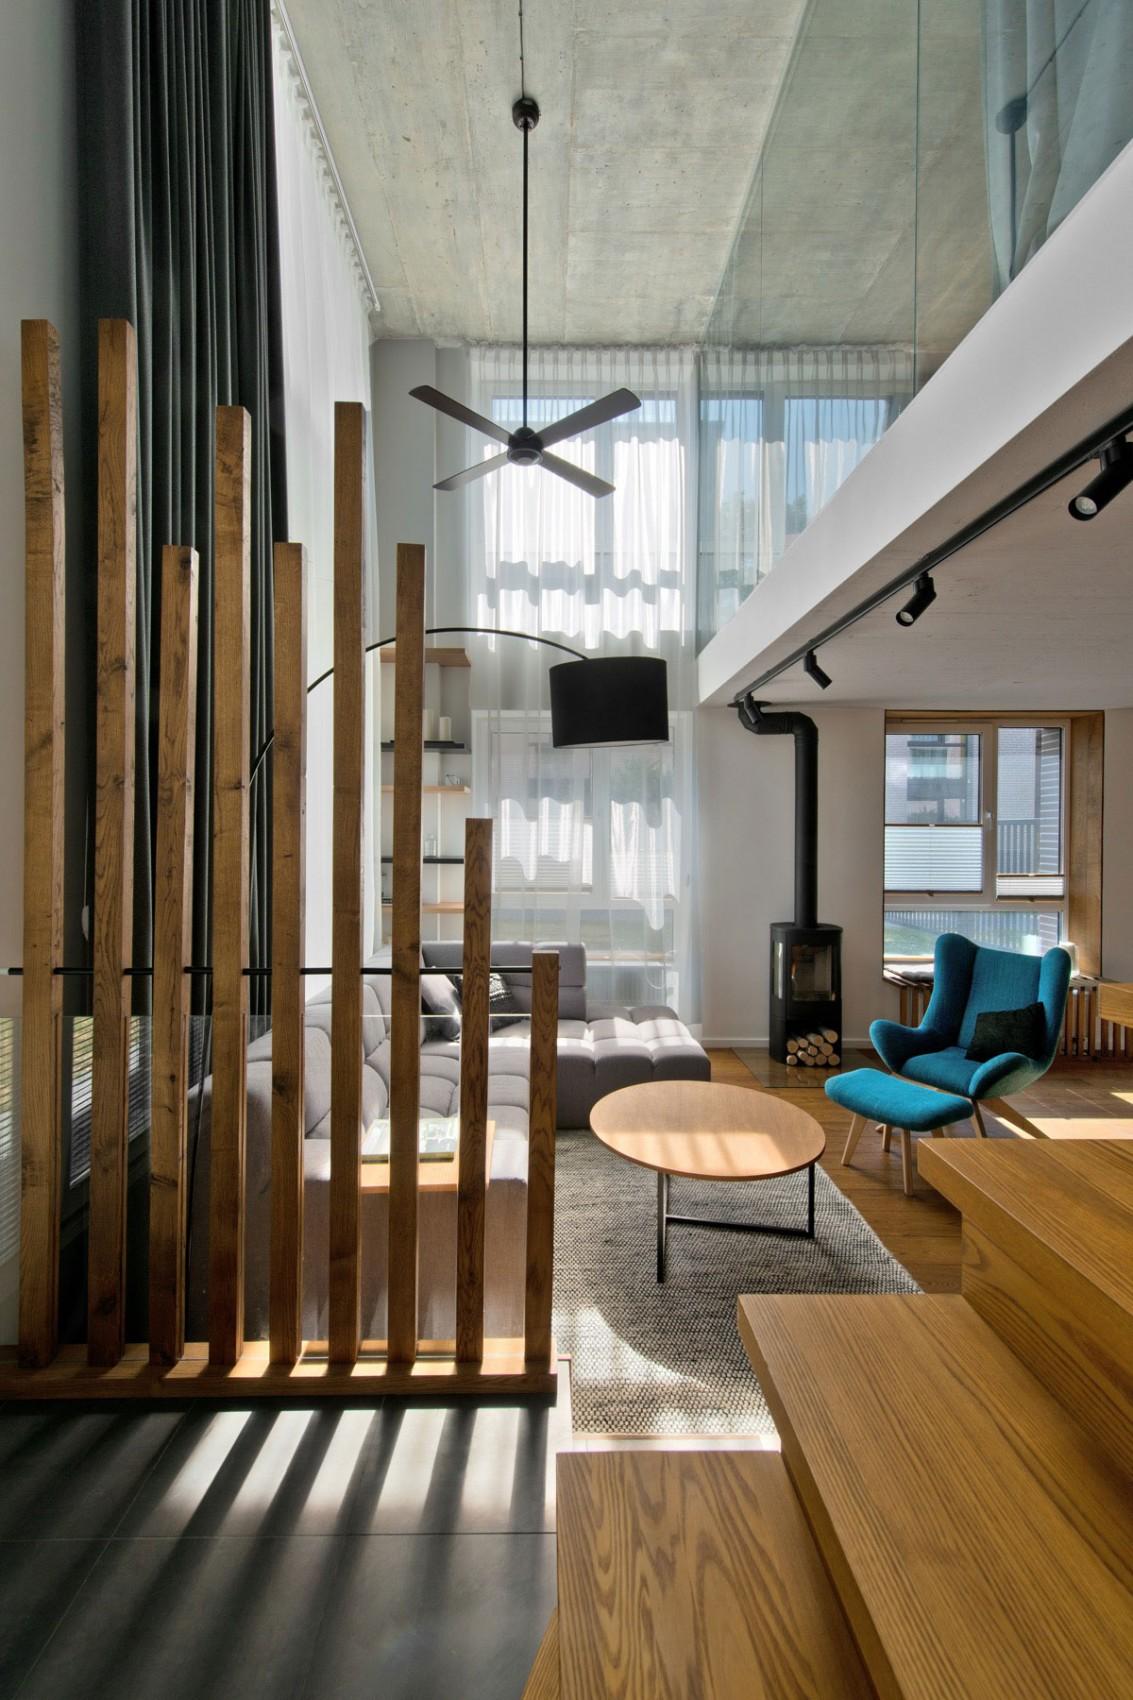 Scandinavian Interior Design In A Beautiful Small Apartment Architecture Beast